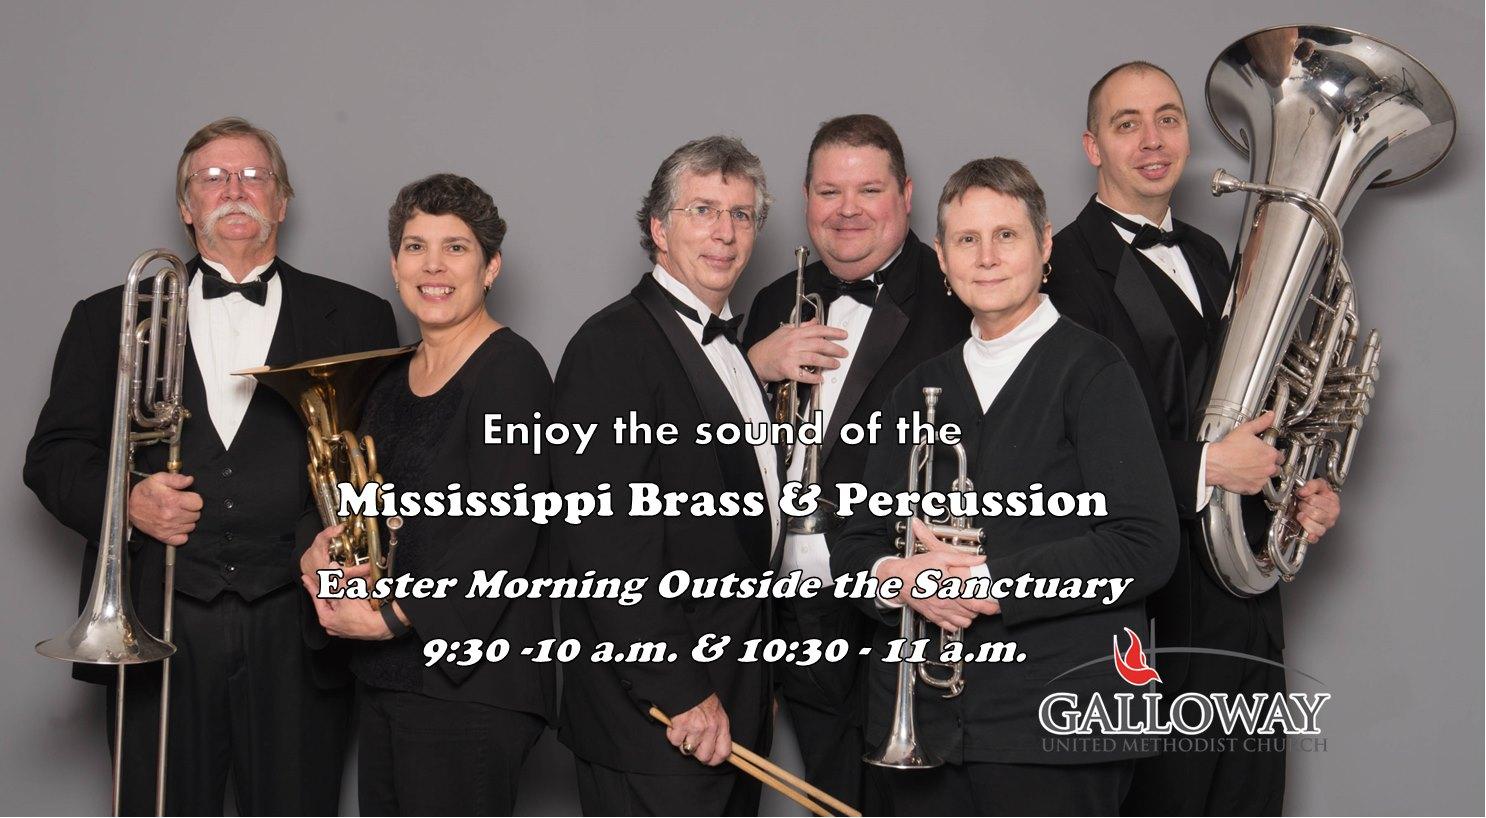 Mississippi Brass & Percussion